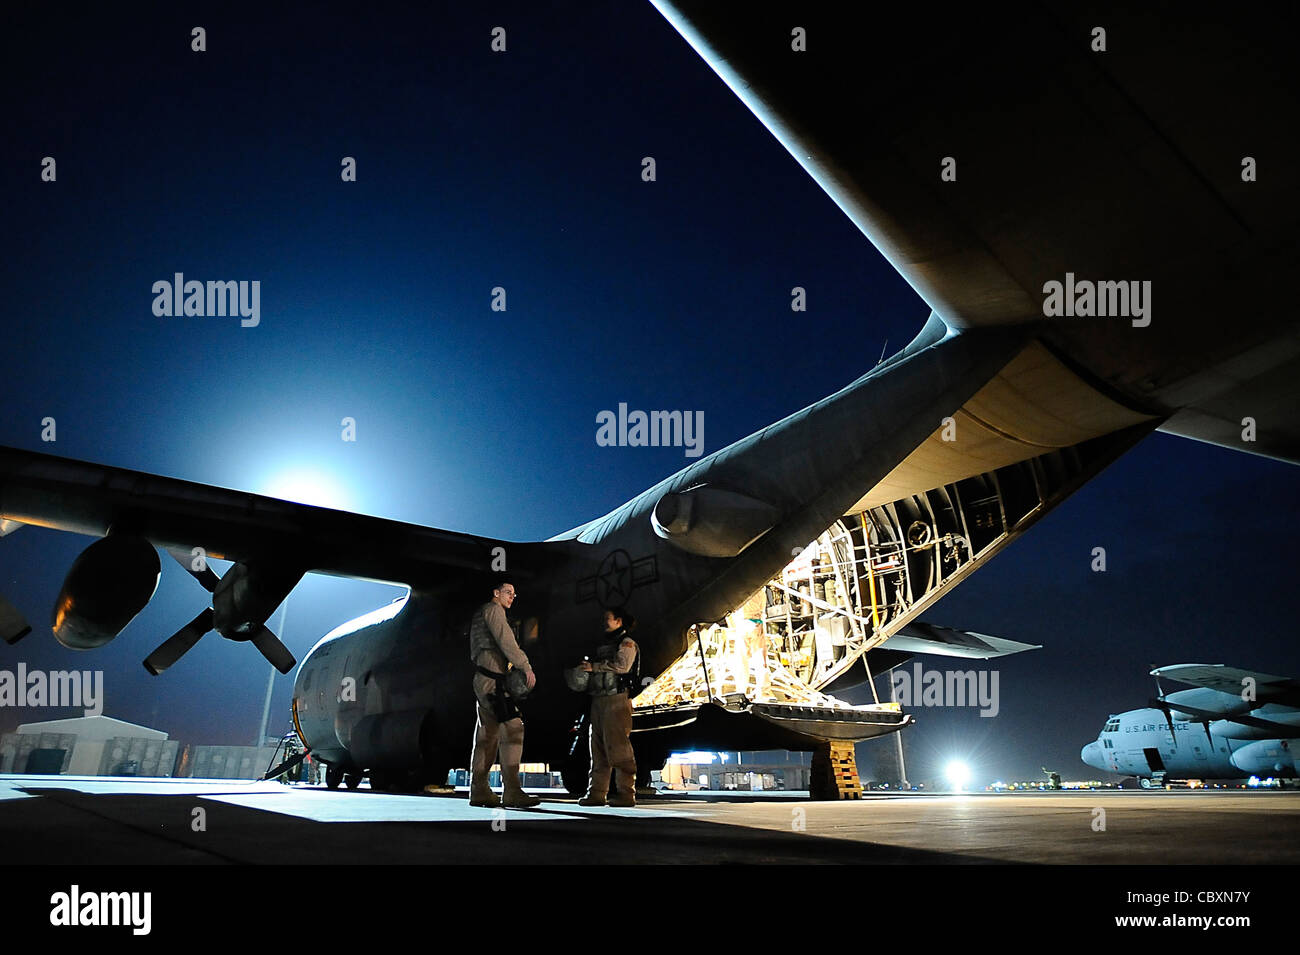 Senior Airmen Matthew Rinehart and Rosie Munoz stand outside of a C-130 Hercules Dec. 31, 2008, at Joint Base Balad, - Stock Image